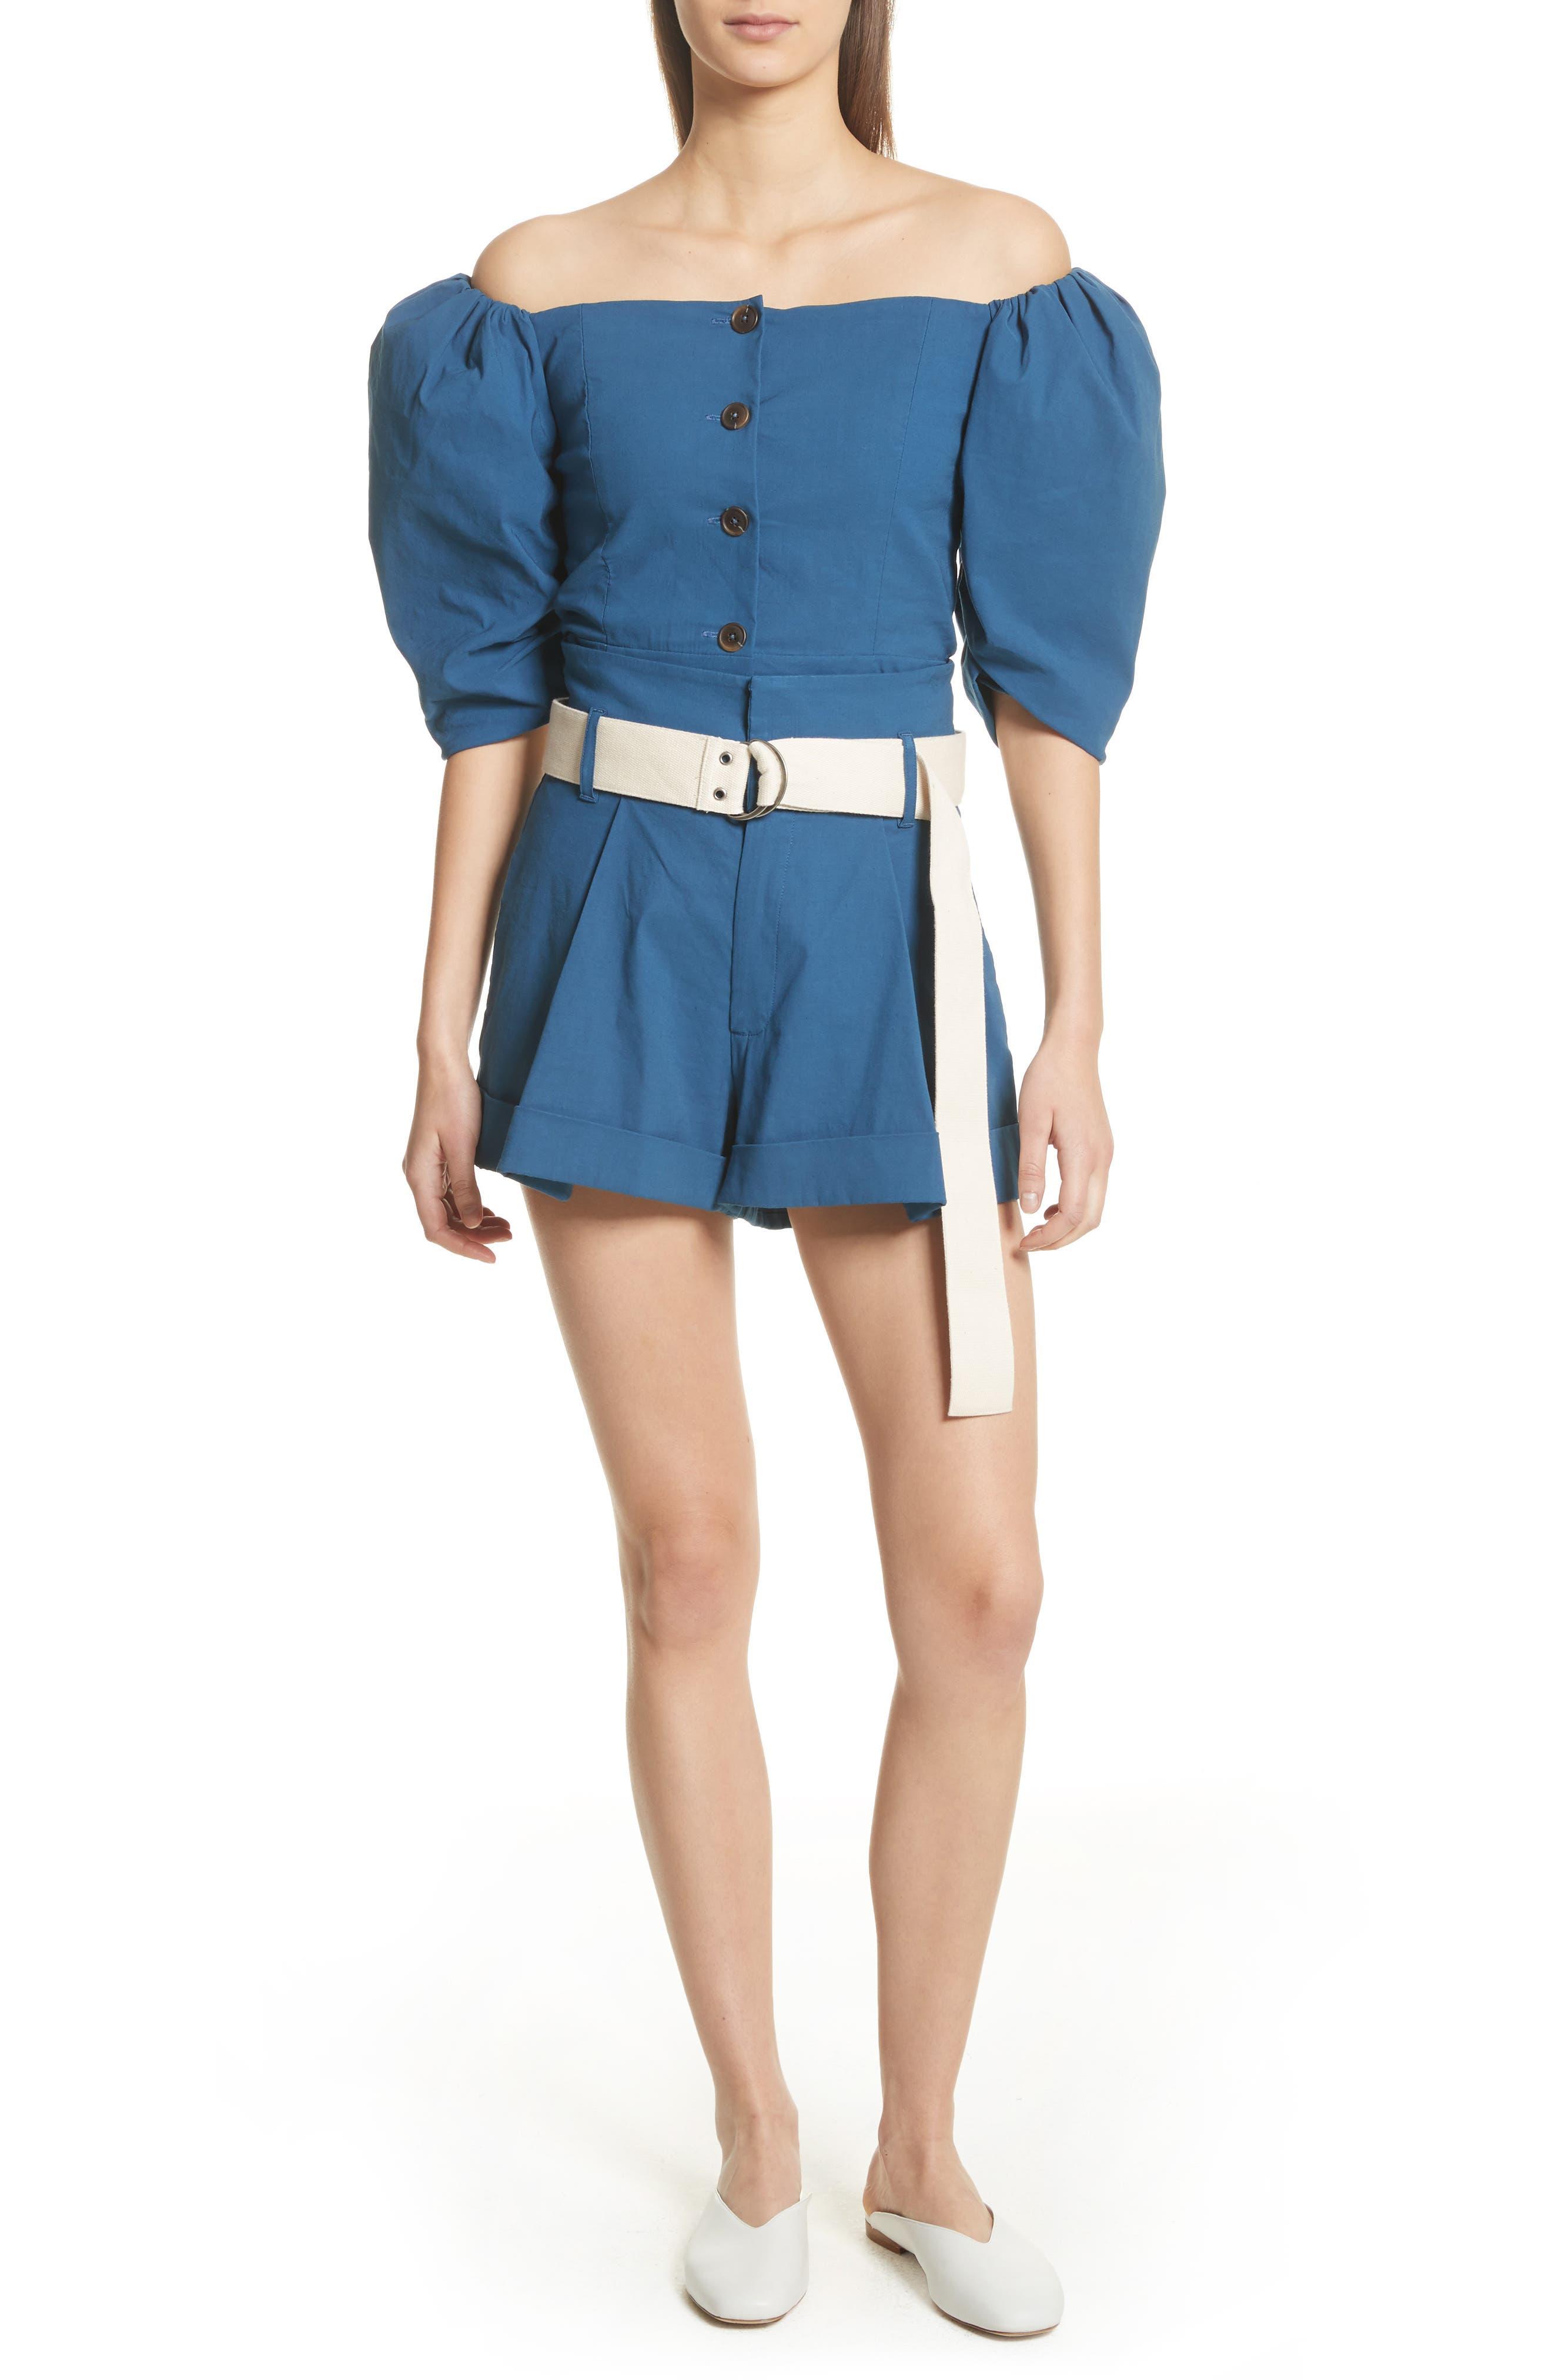 Poppy Belted Cotton & Linen Blend Shorts,                             Alternate thumbnail 7, color,                             Blue